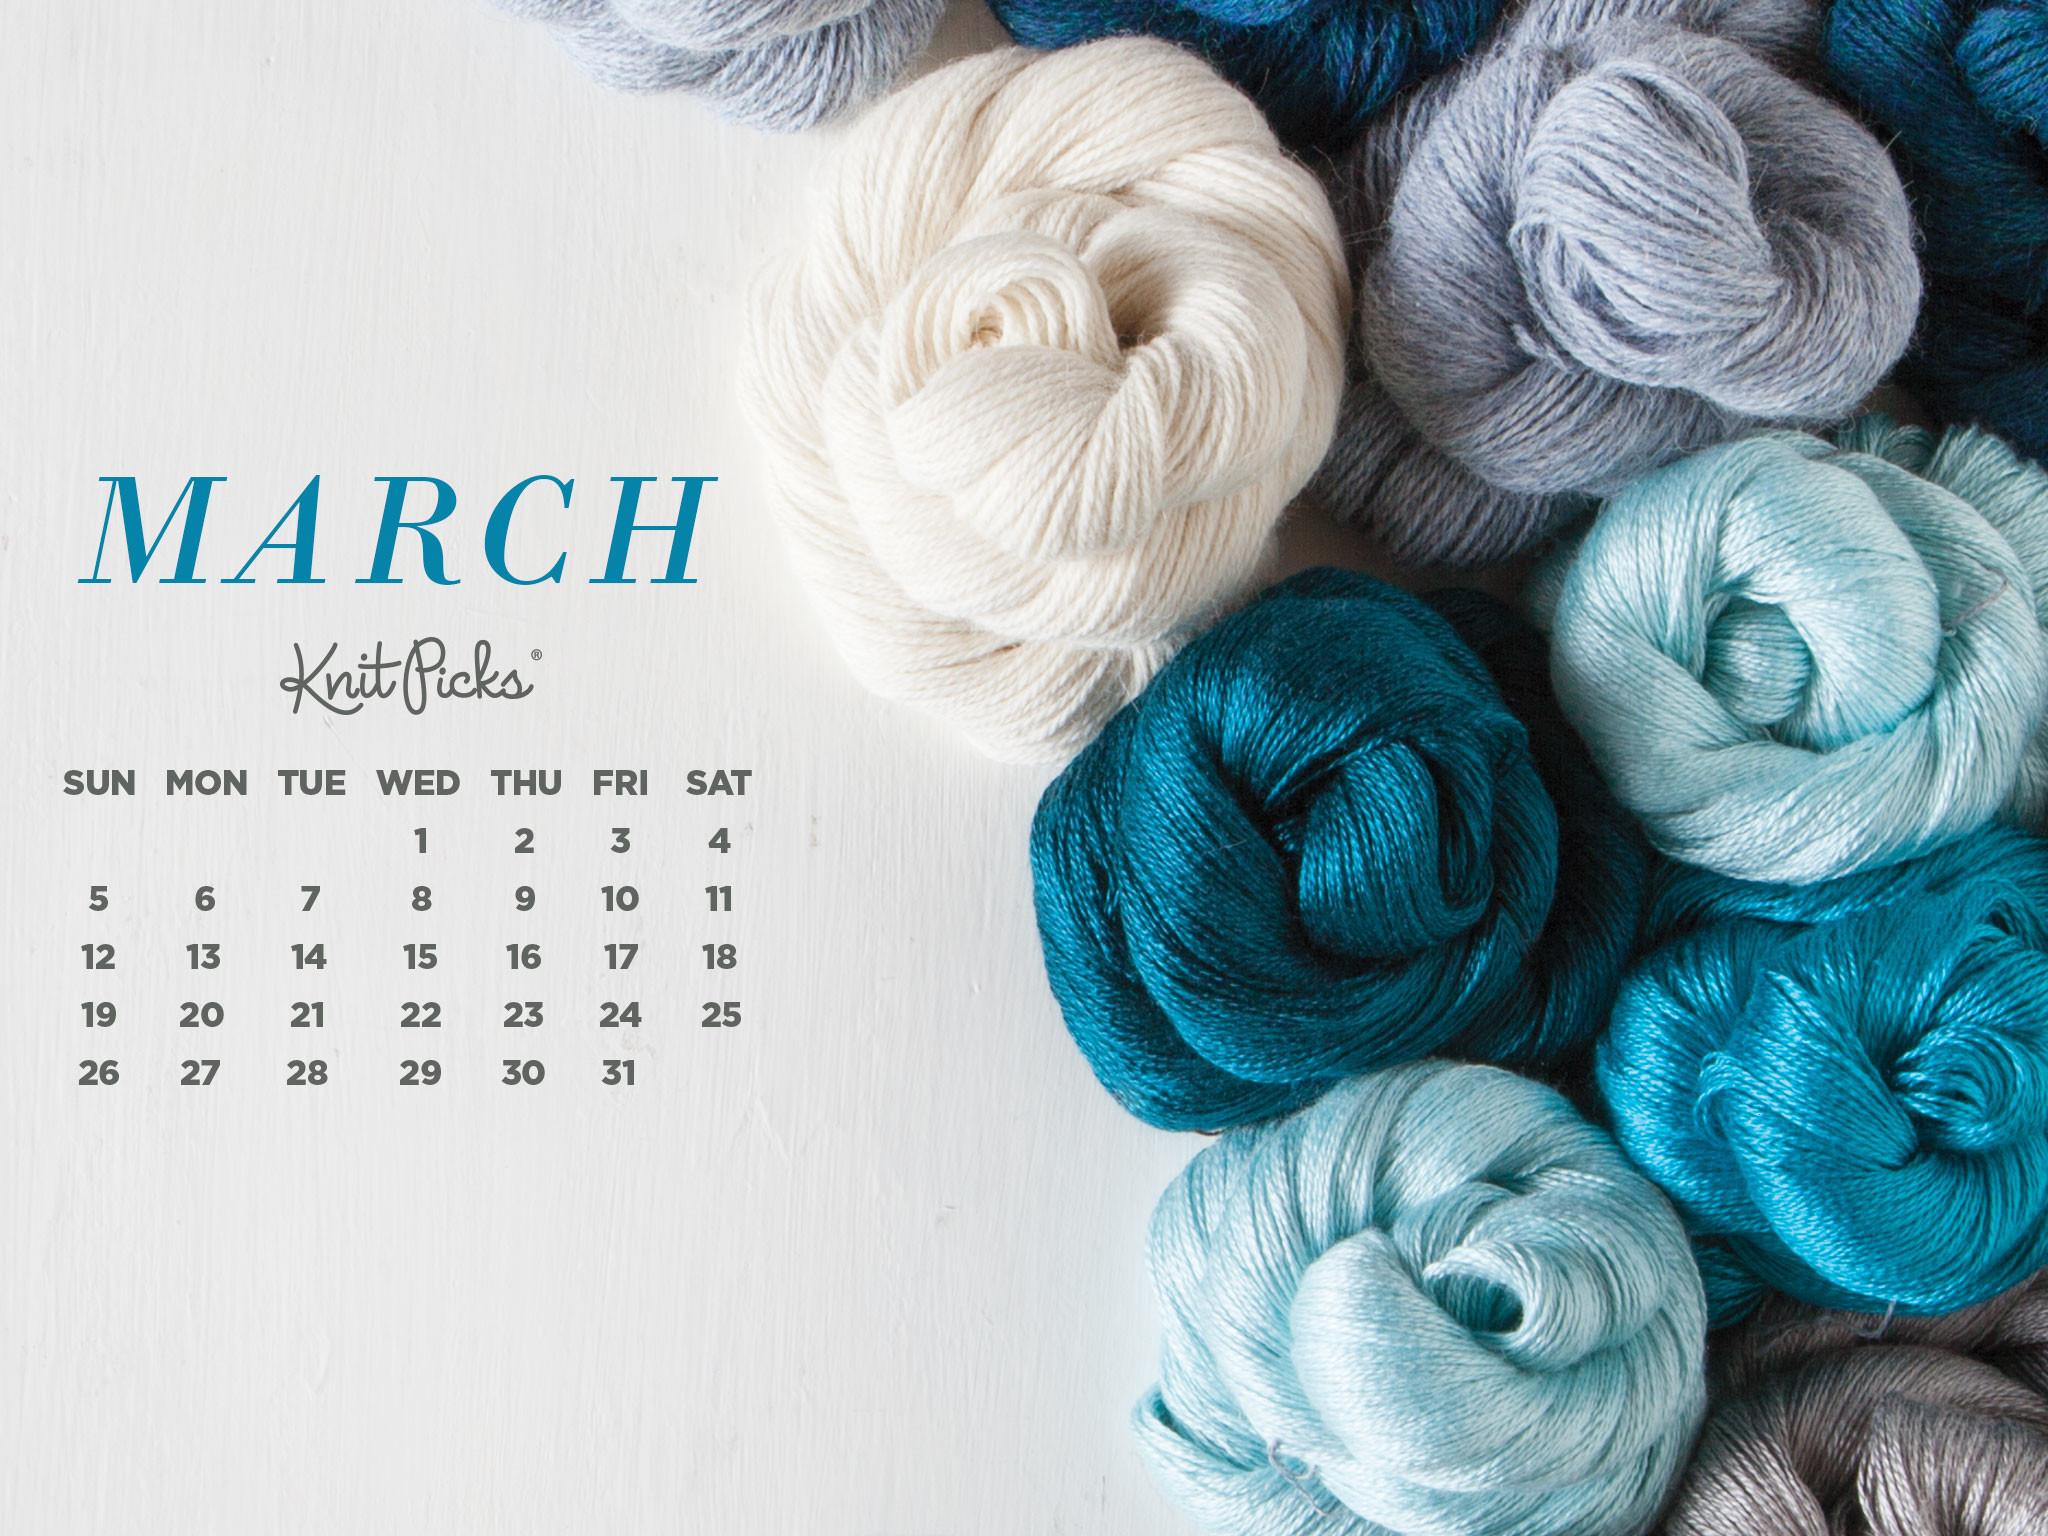 Cute Downloadable Wallpapers Wallpaper Calendar March 2018 73 Images